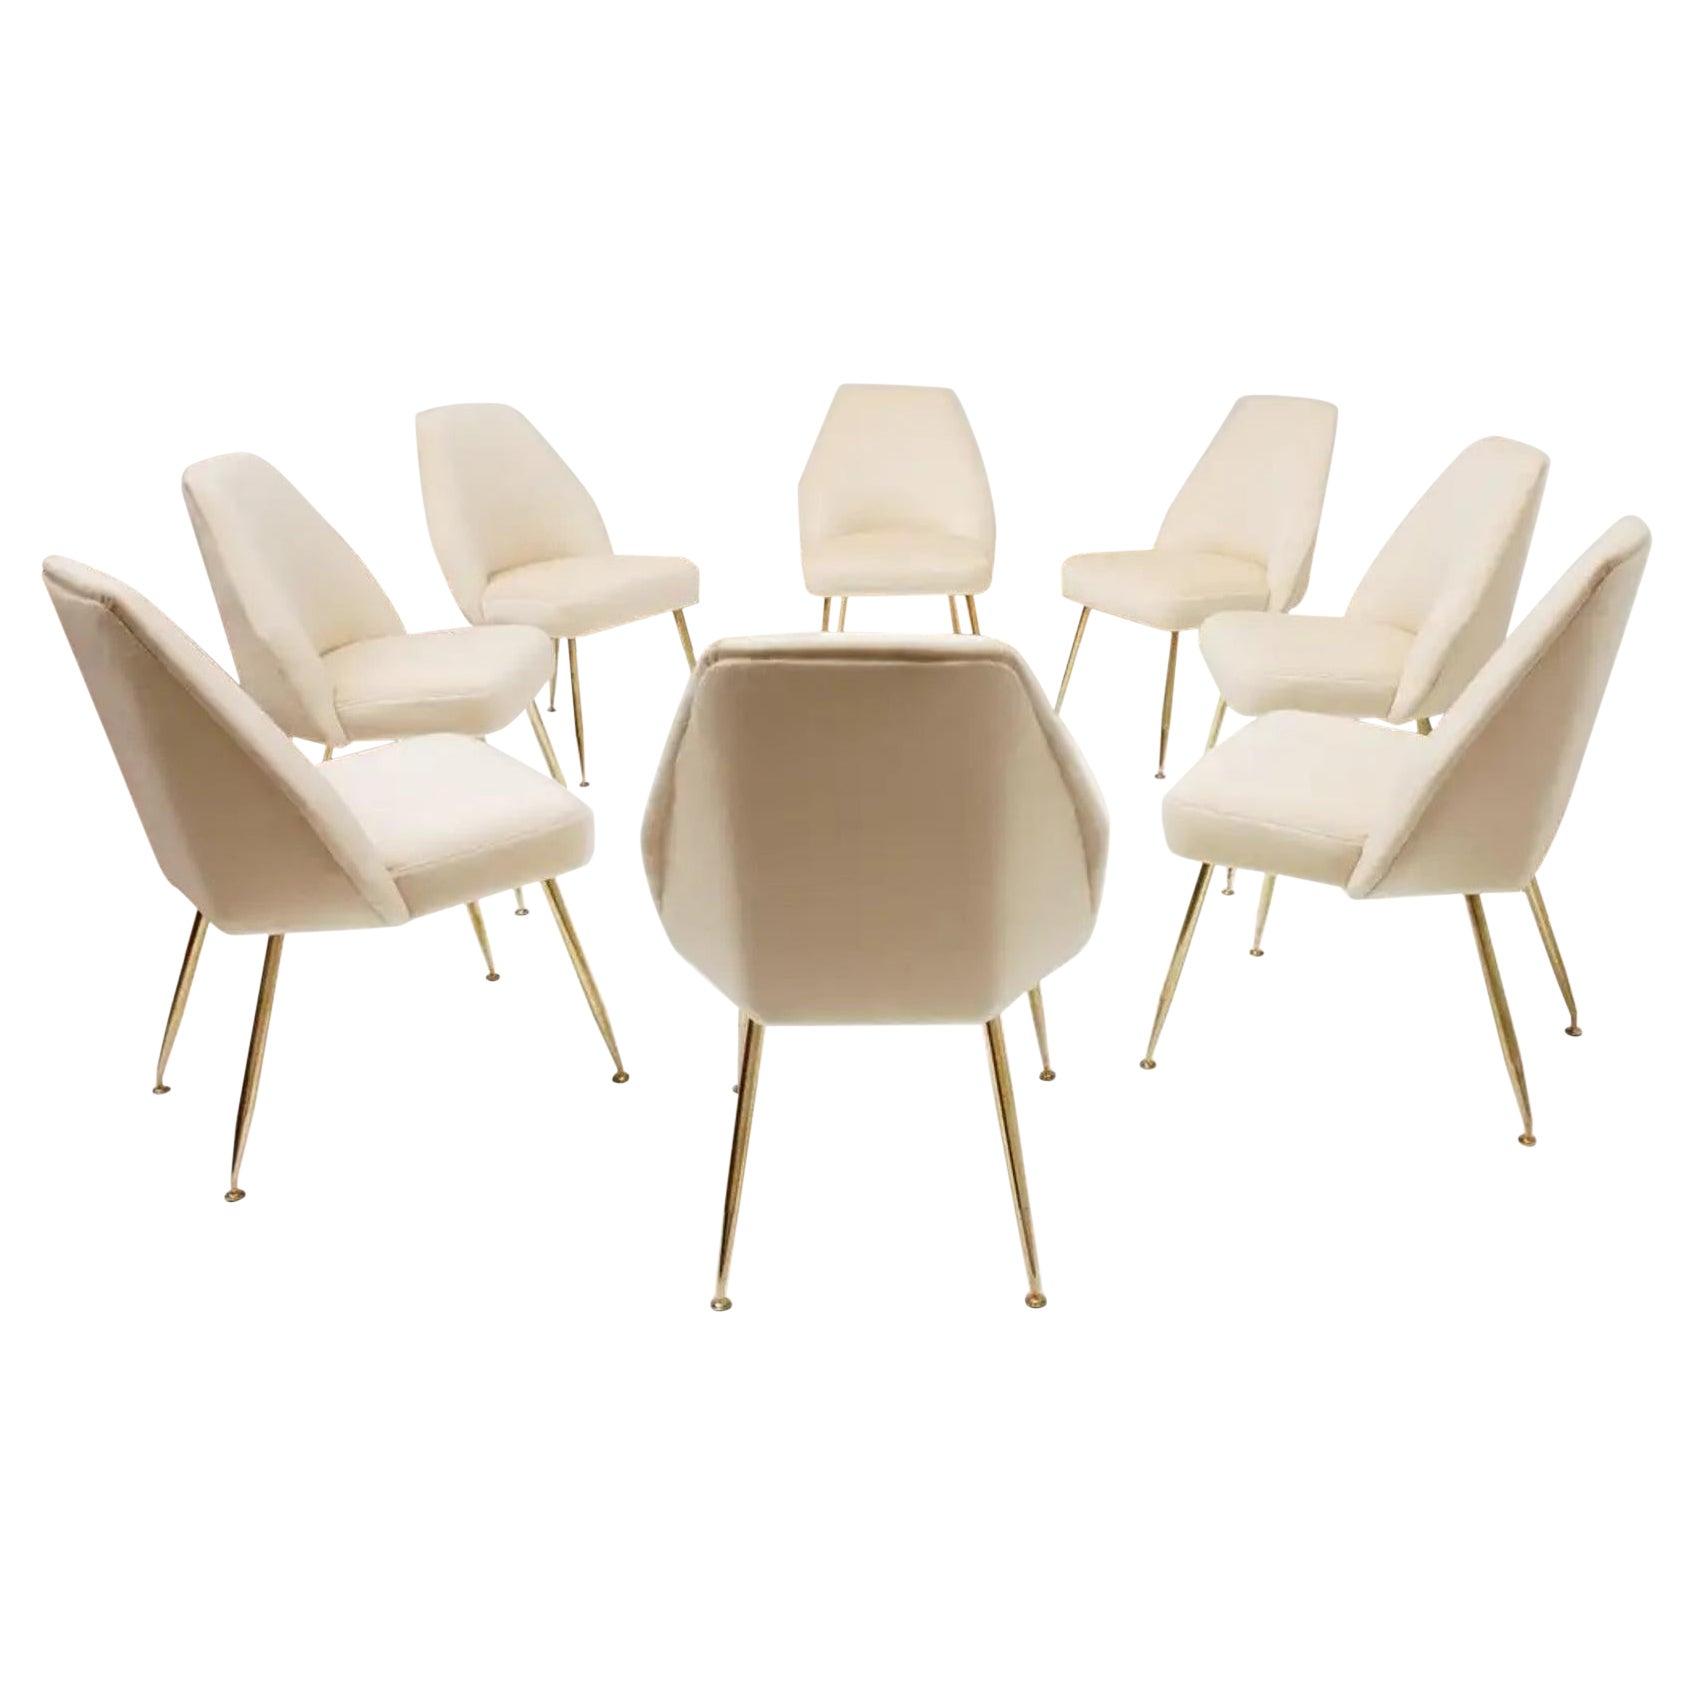 8 Brass Leg Chairs by Pagani,Partner of Gio Ponti & Lina Bo Bardi, 1952, Arflex